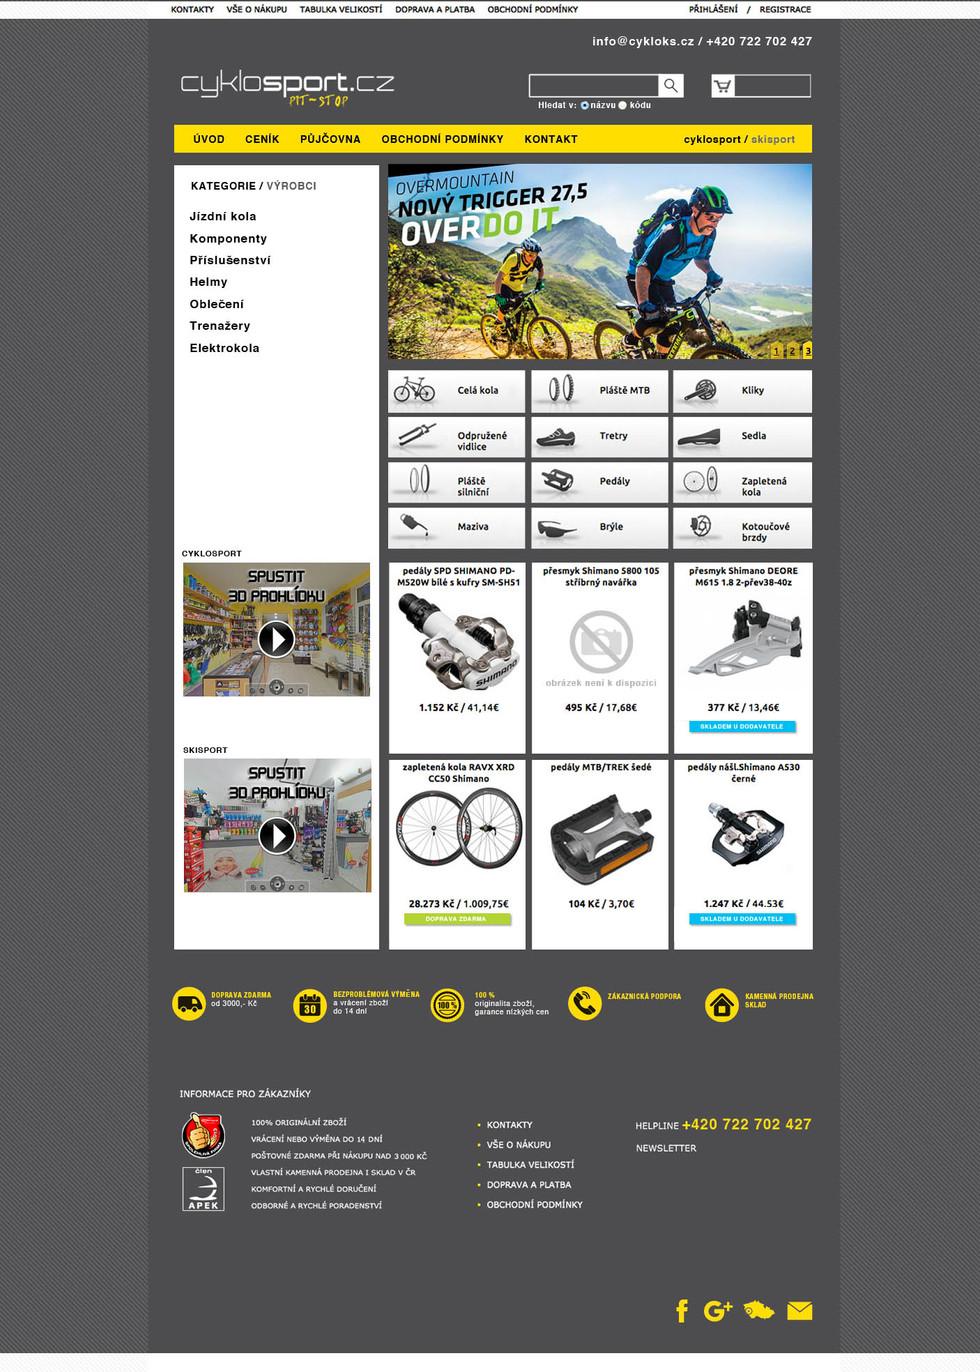 cyklo_uprava.jpg